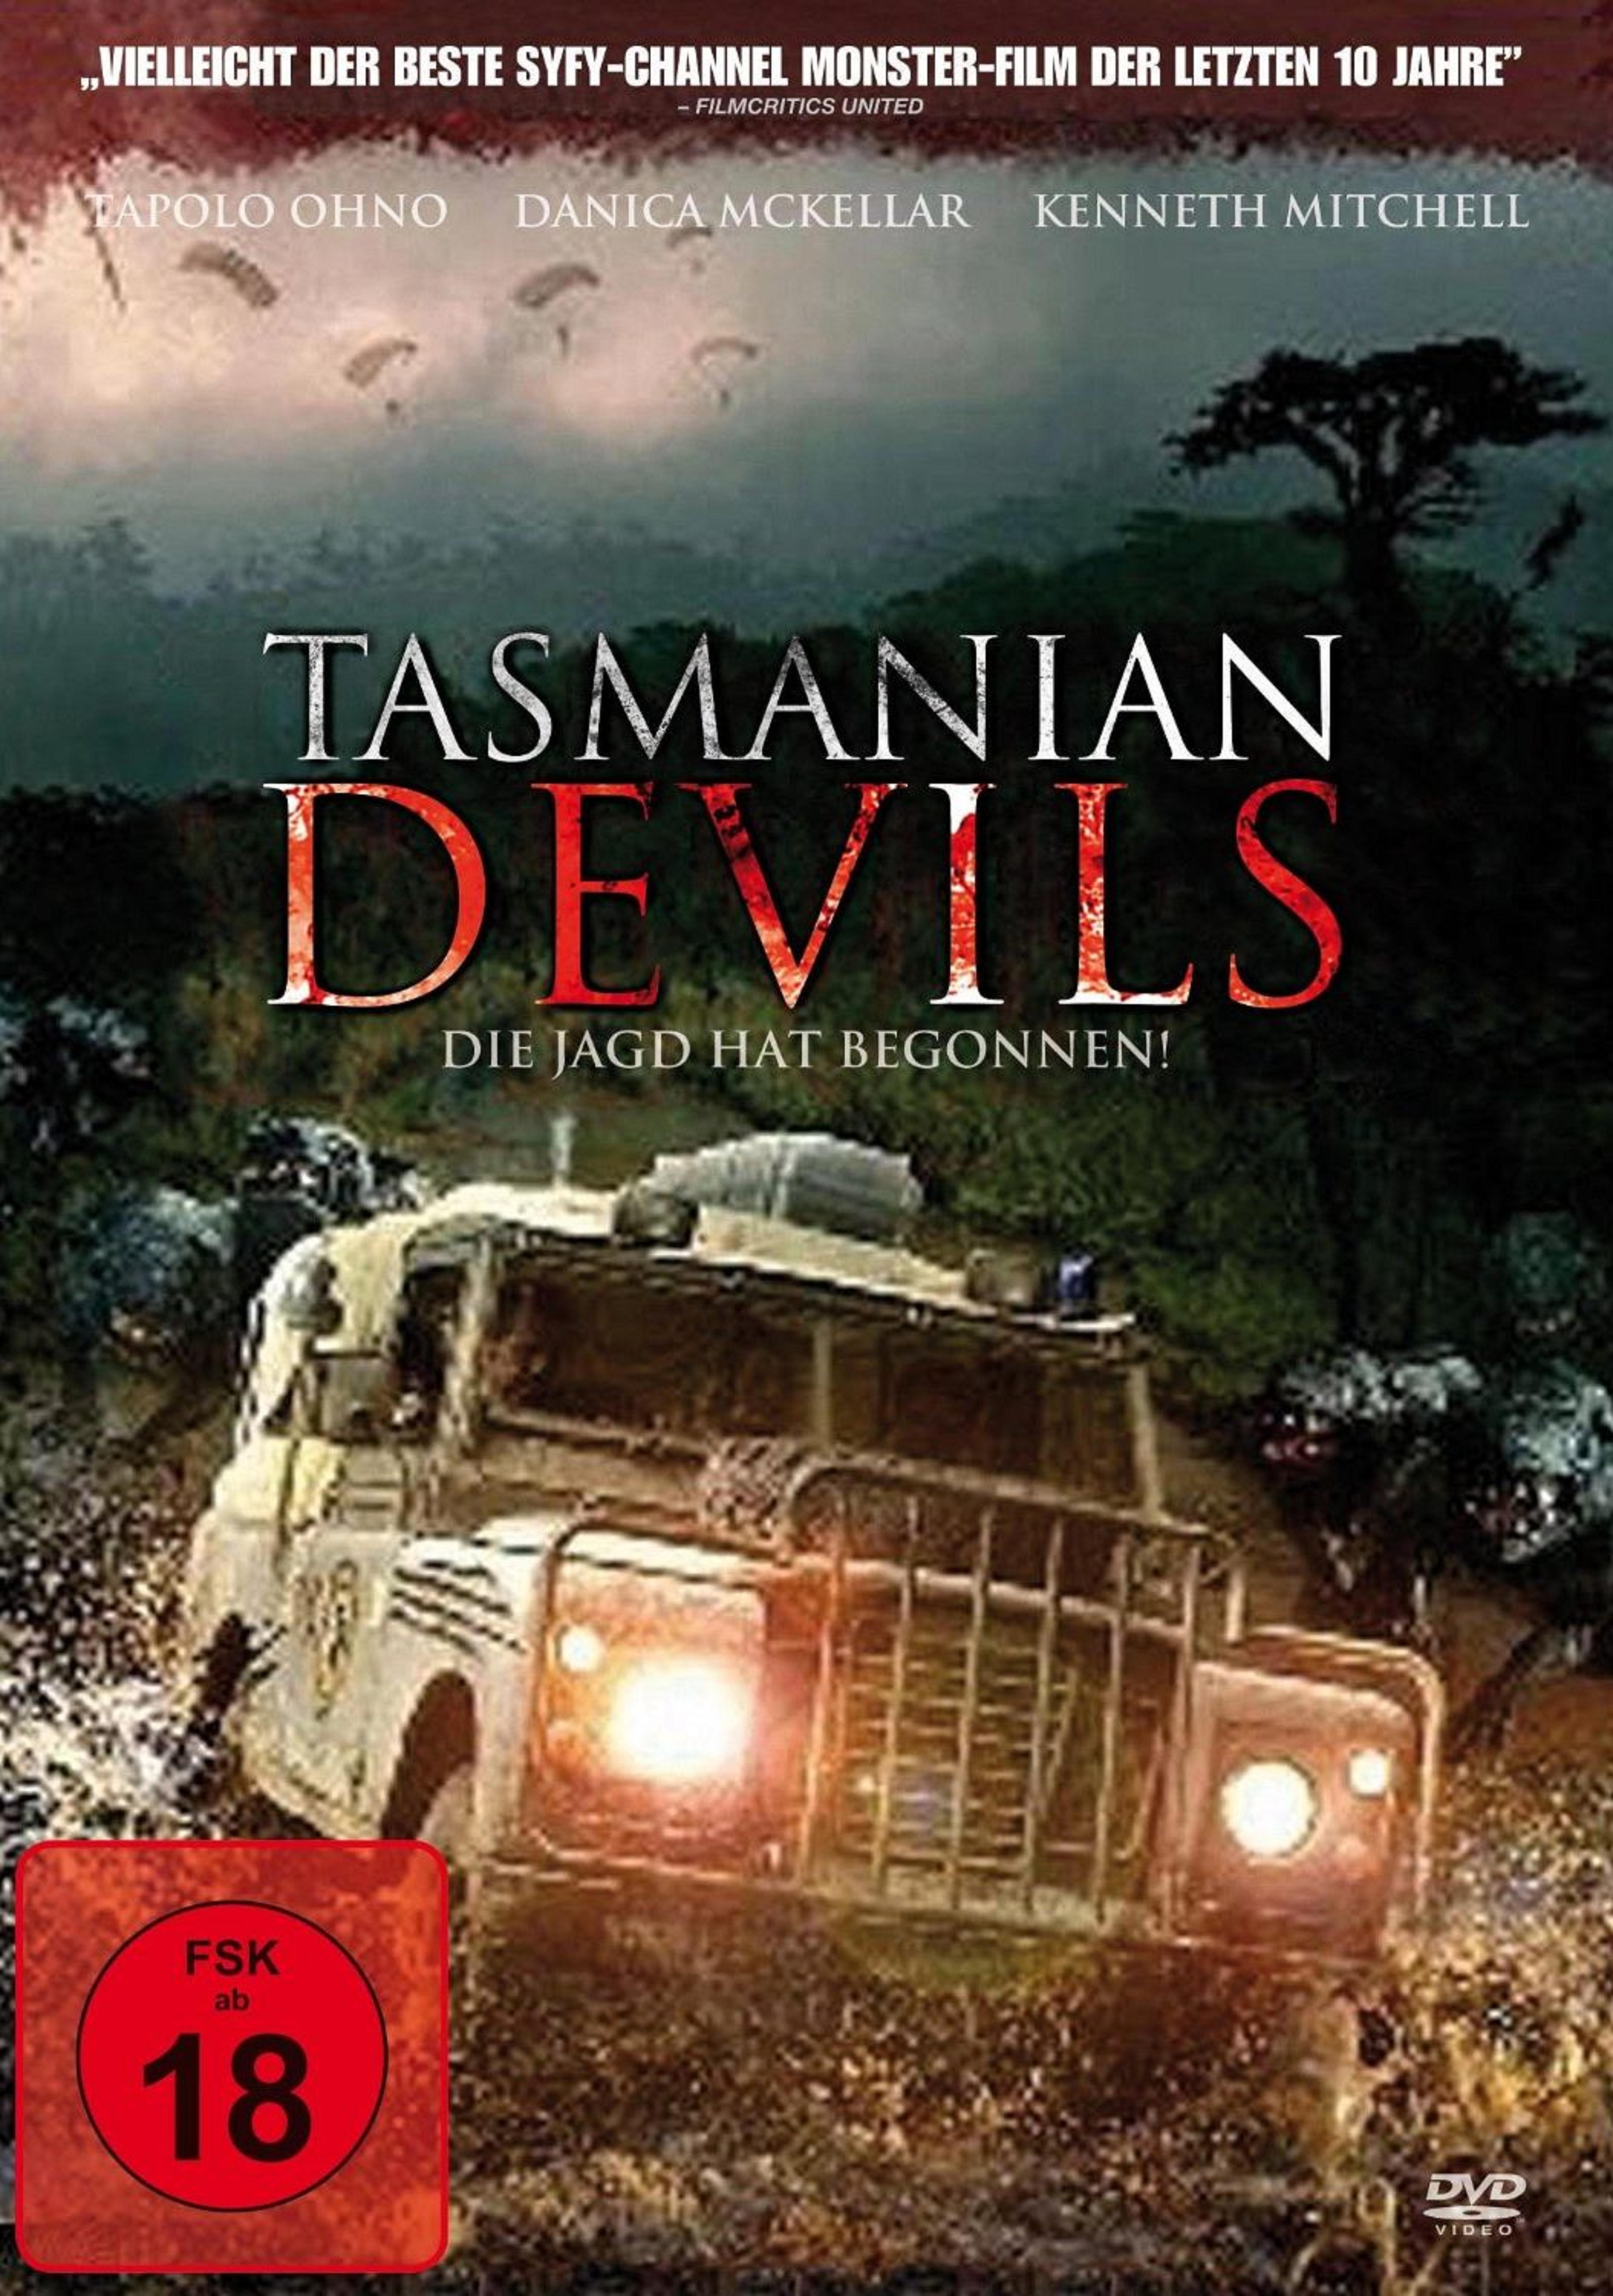 Tasmanian Devils 2013 Hindi Dual Audio 720p BluRay 970MB Download